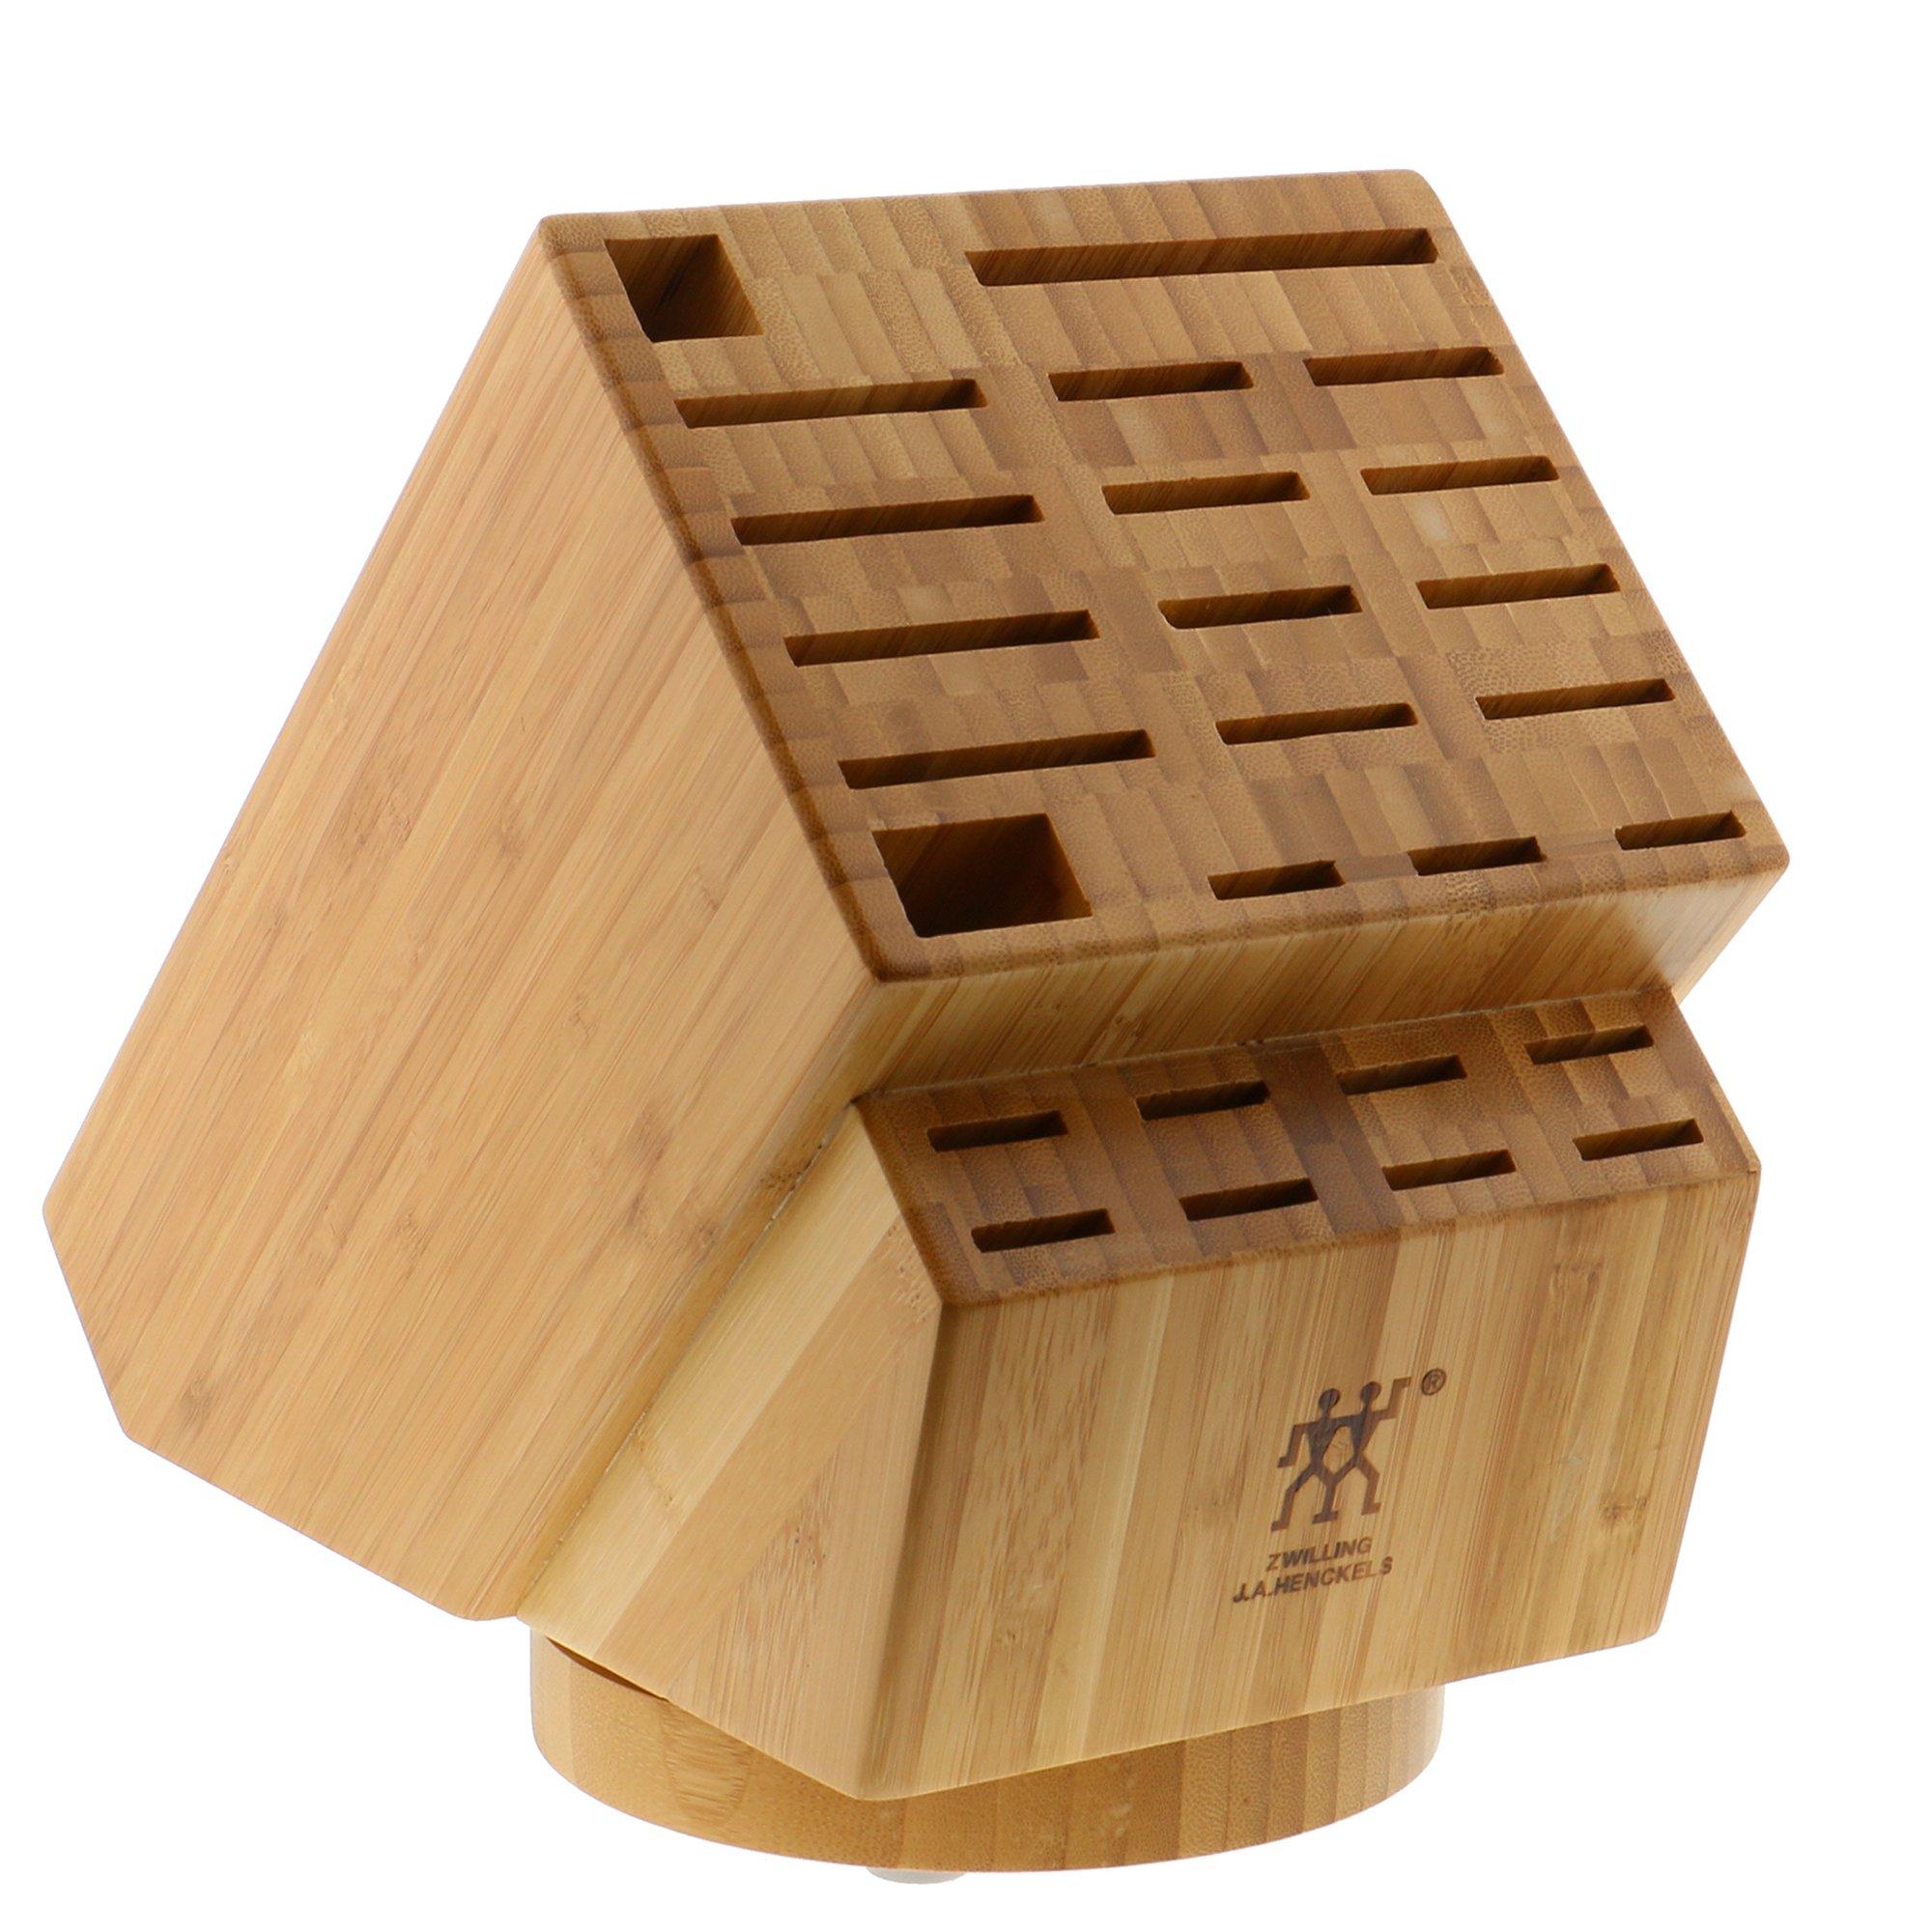 Zwilling J.A. Henckels 35101-840 26-Slot Bamboo Swivel Knife Block by ZWILLING J.A. Henckels